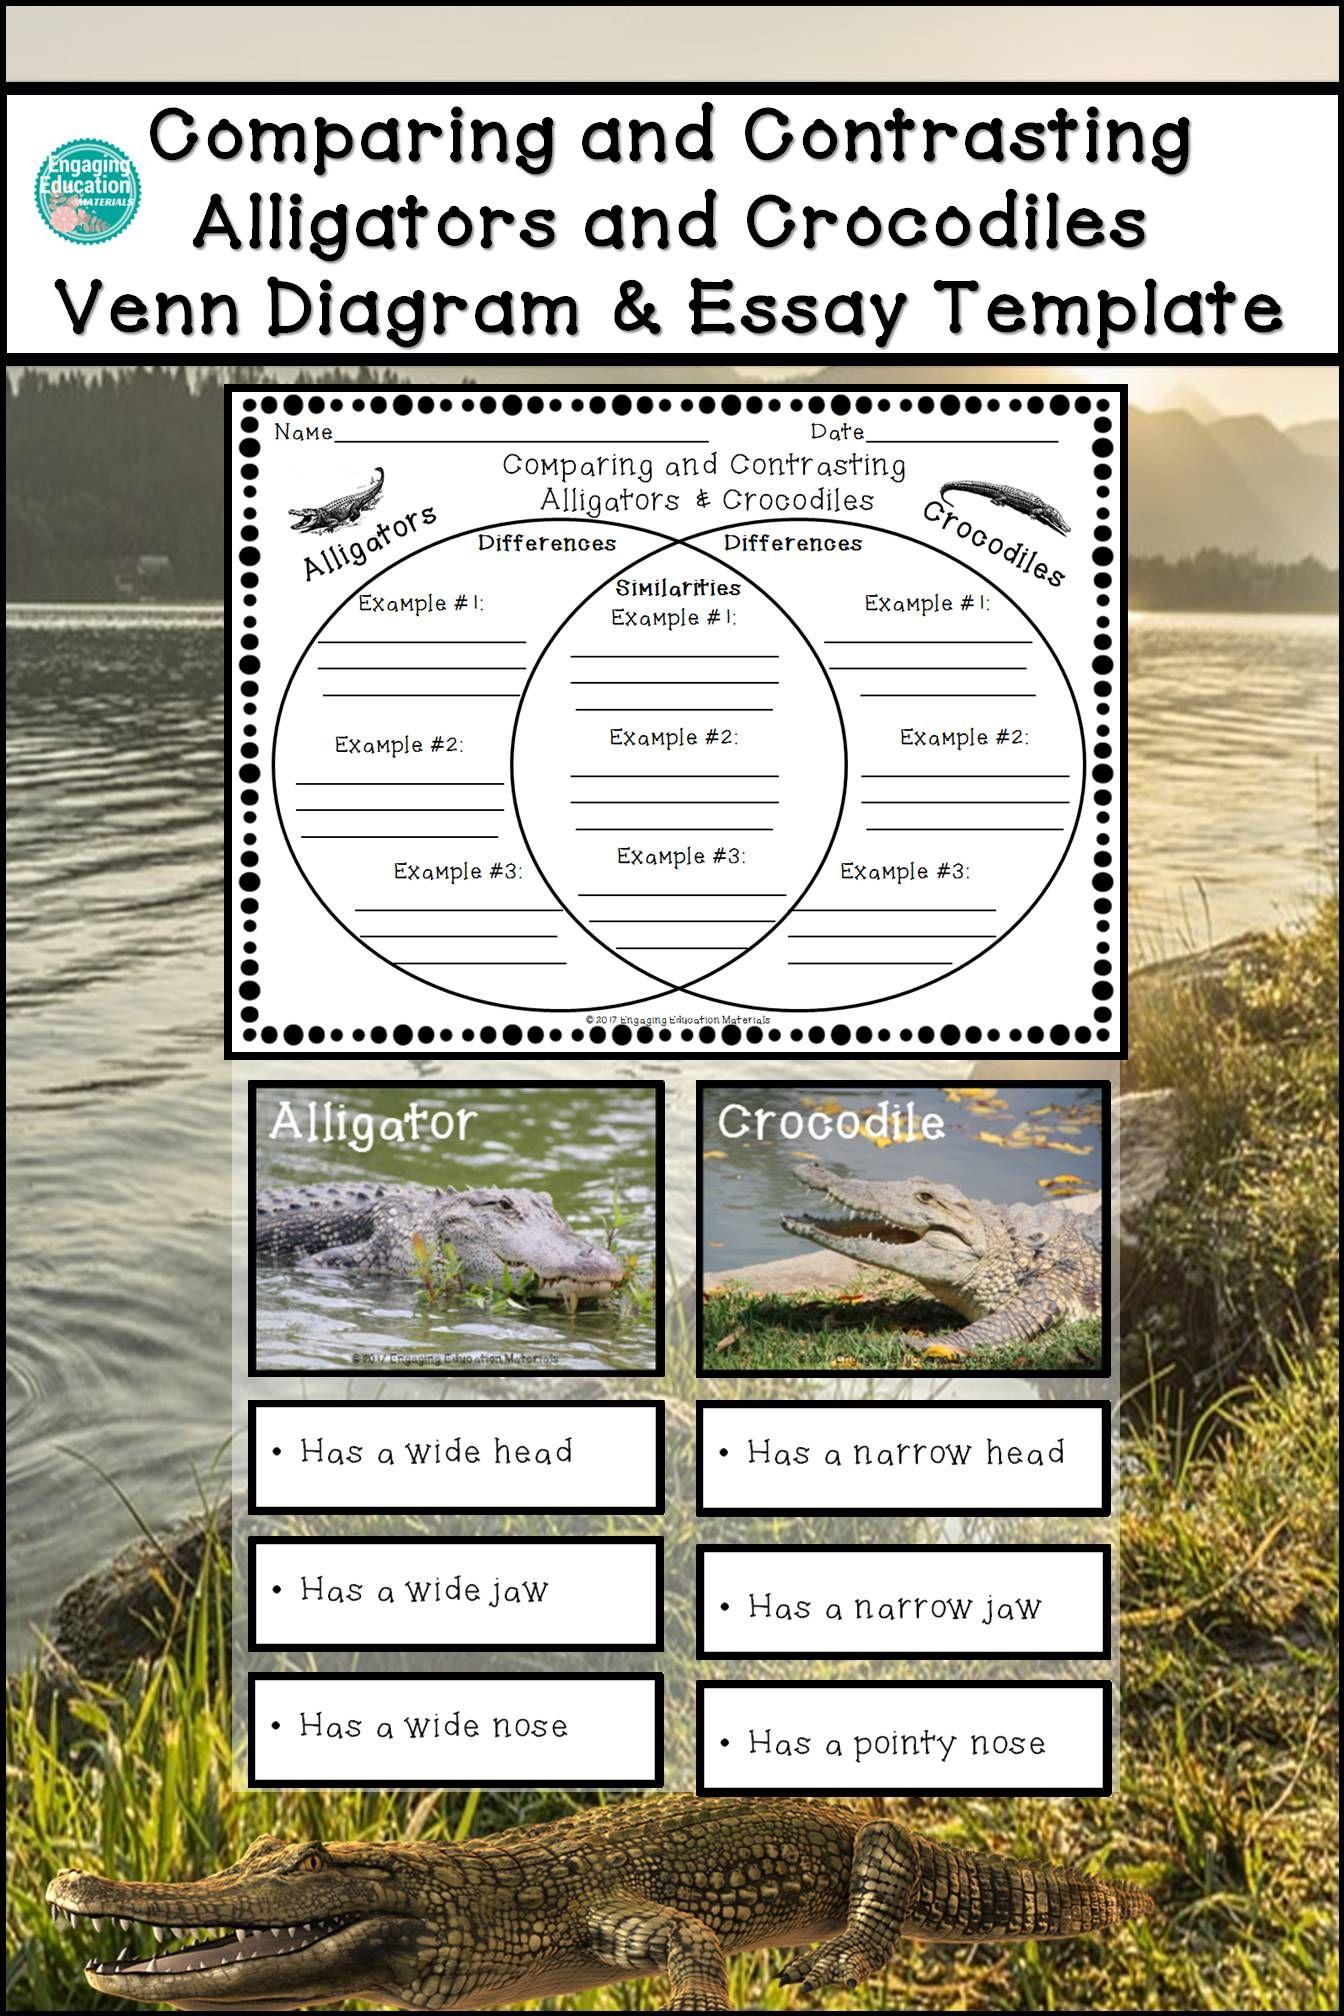 cinderella venn diagram compare contrast 2008 impala radio wiring comparing and contrasting alligators crocodiles